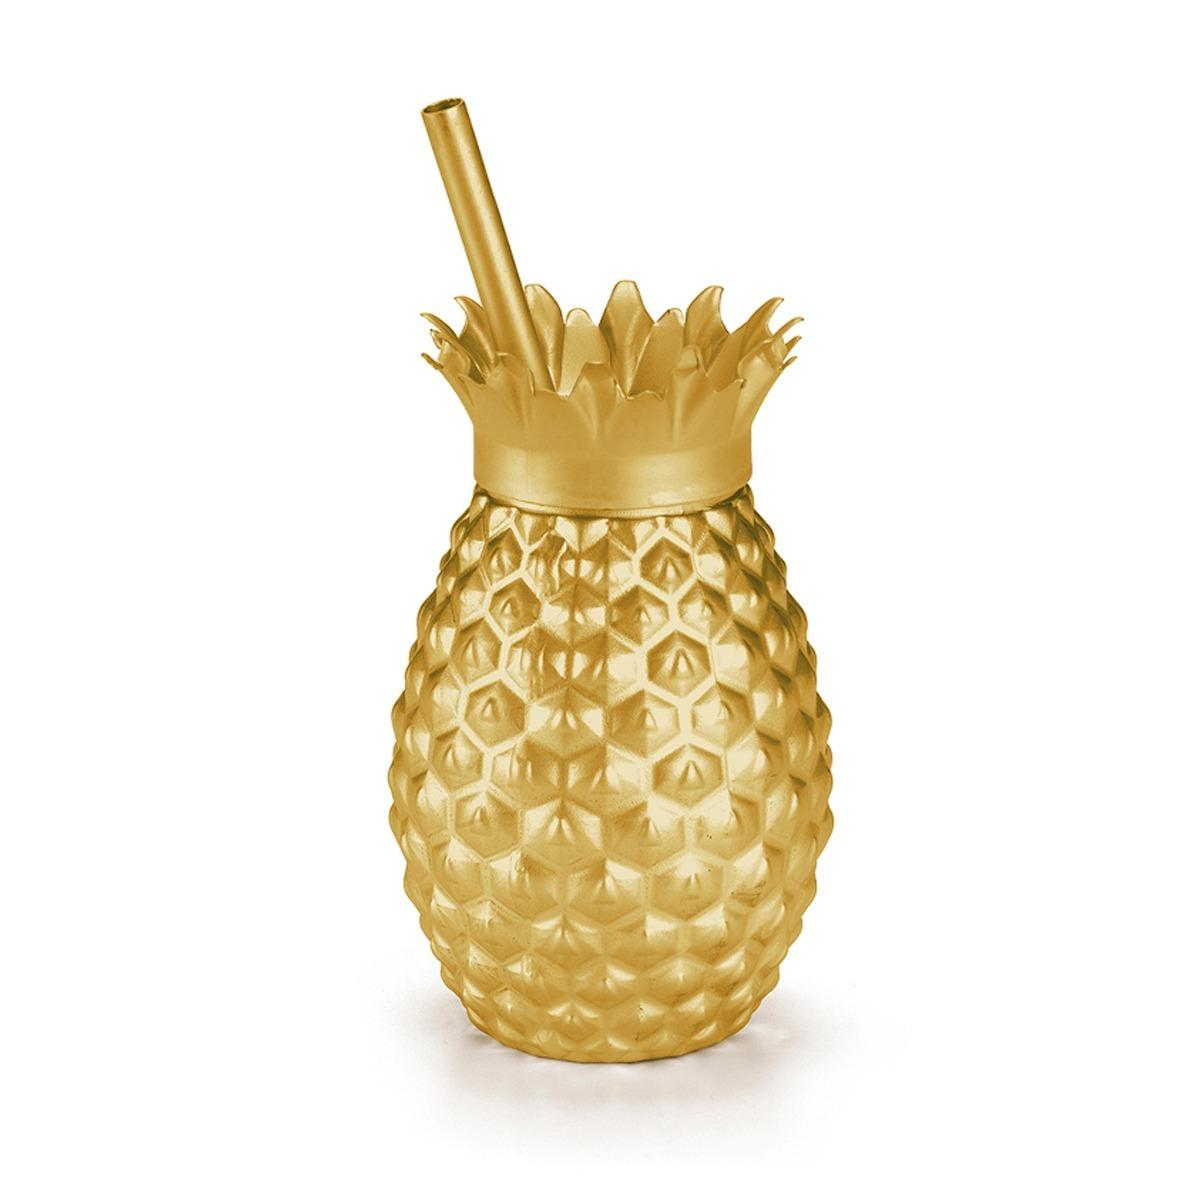 5 Copos Abacaxi Dourado Lembrancinhas Casa E Festa Havaiana R 49